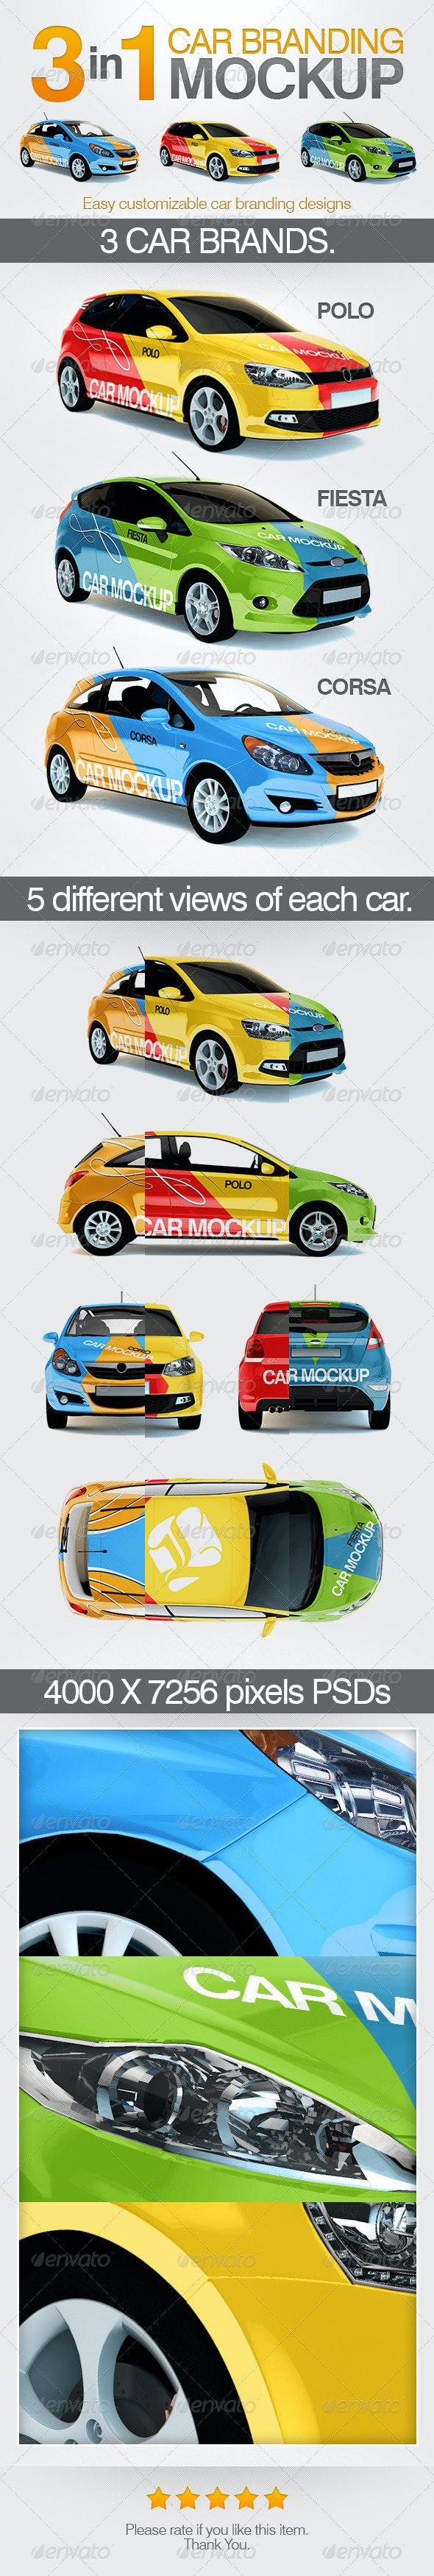 3in1 Car Branding Mock Up - Vehicle Wraps Print